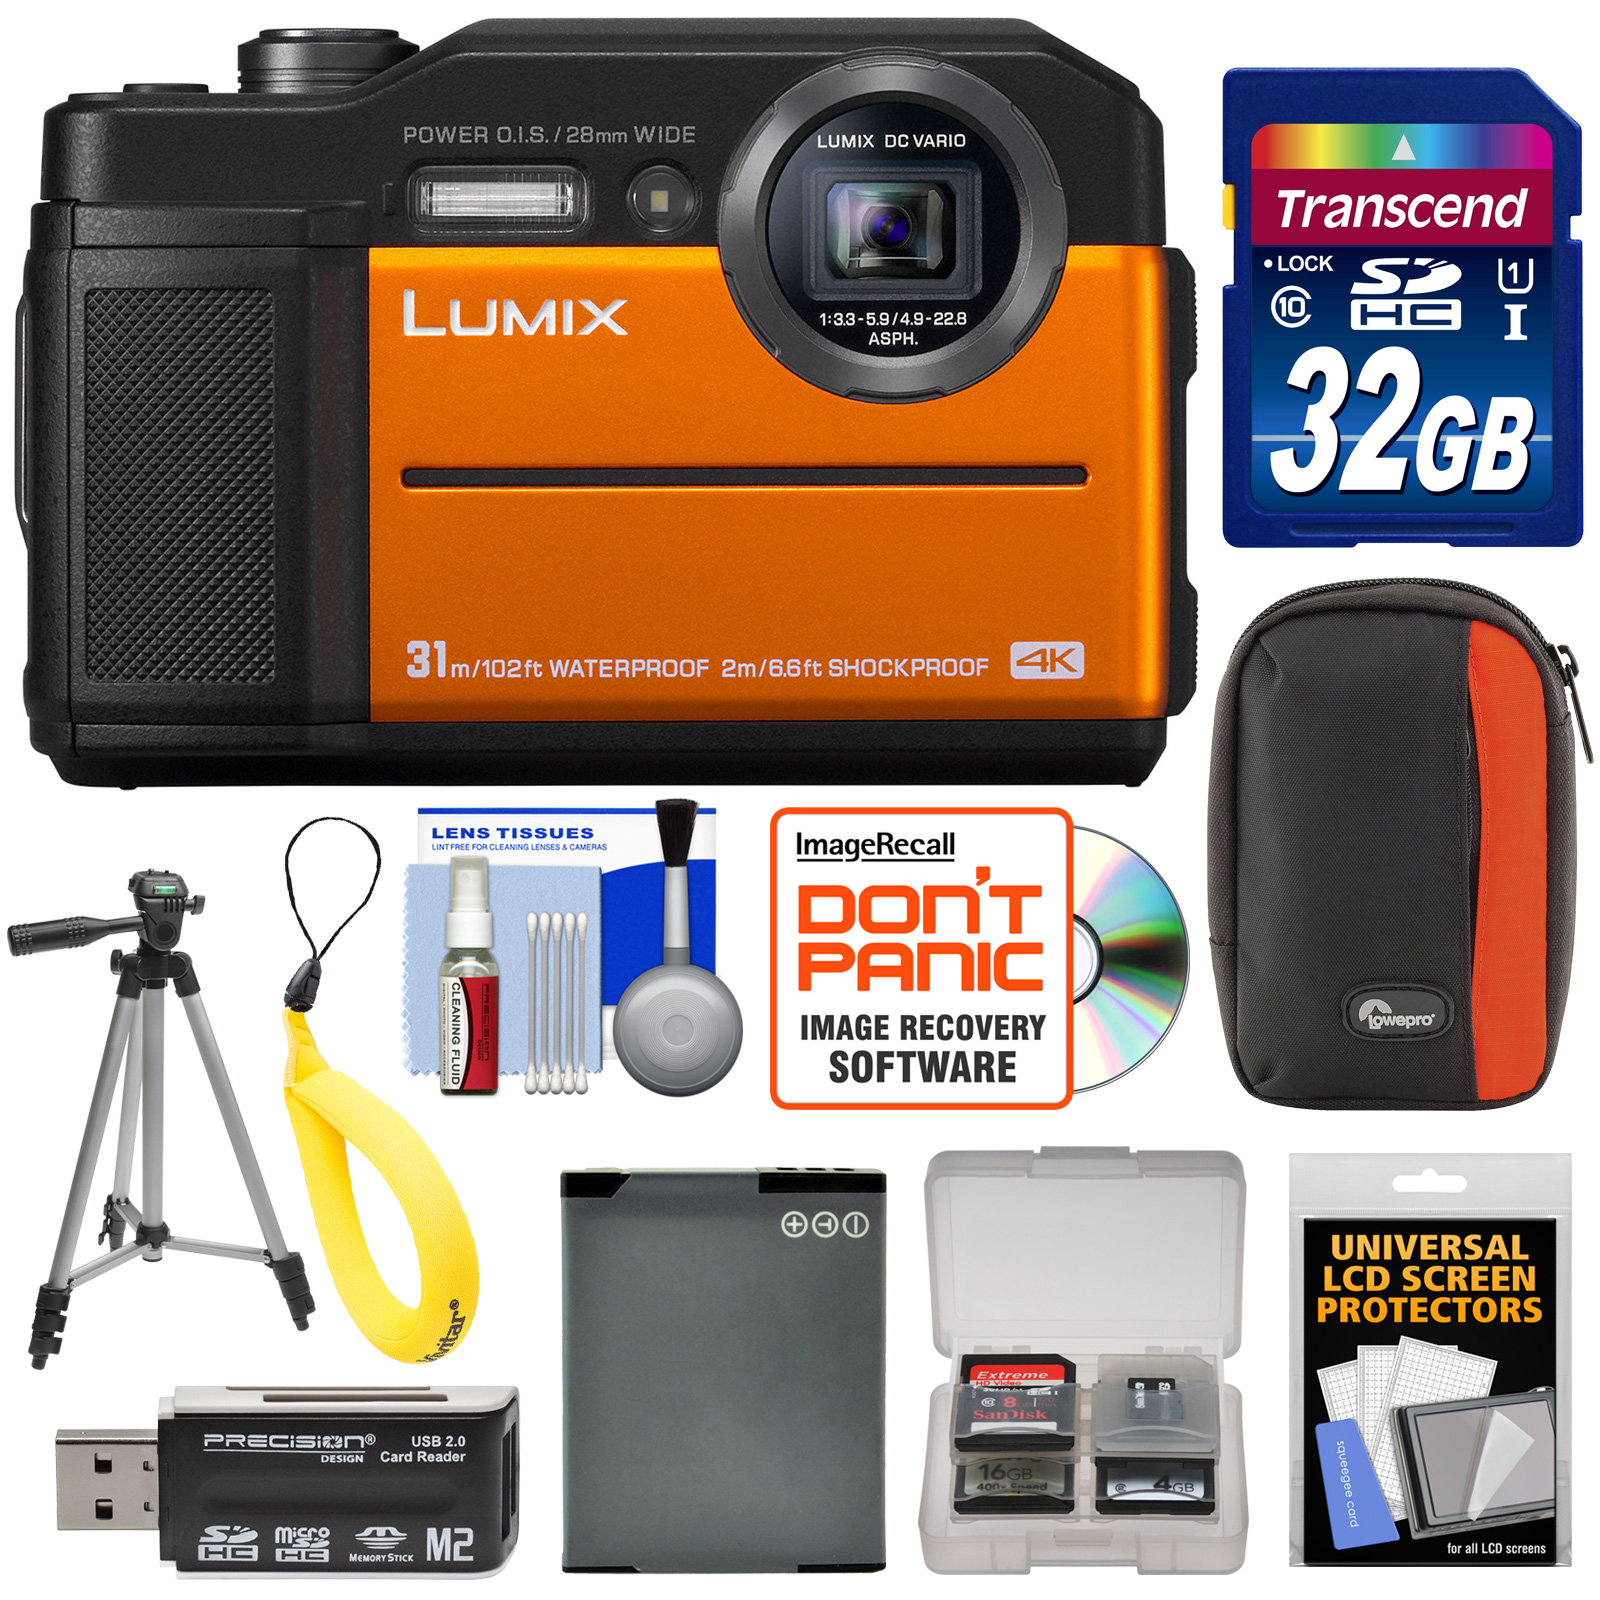 Panasonic Lumix DC-TS7 4K Tough Shock & Waterproof Digital Camera (Orange) with 32GB Card + Battery + Case + Floating Strap + Tripod + Kit